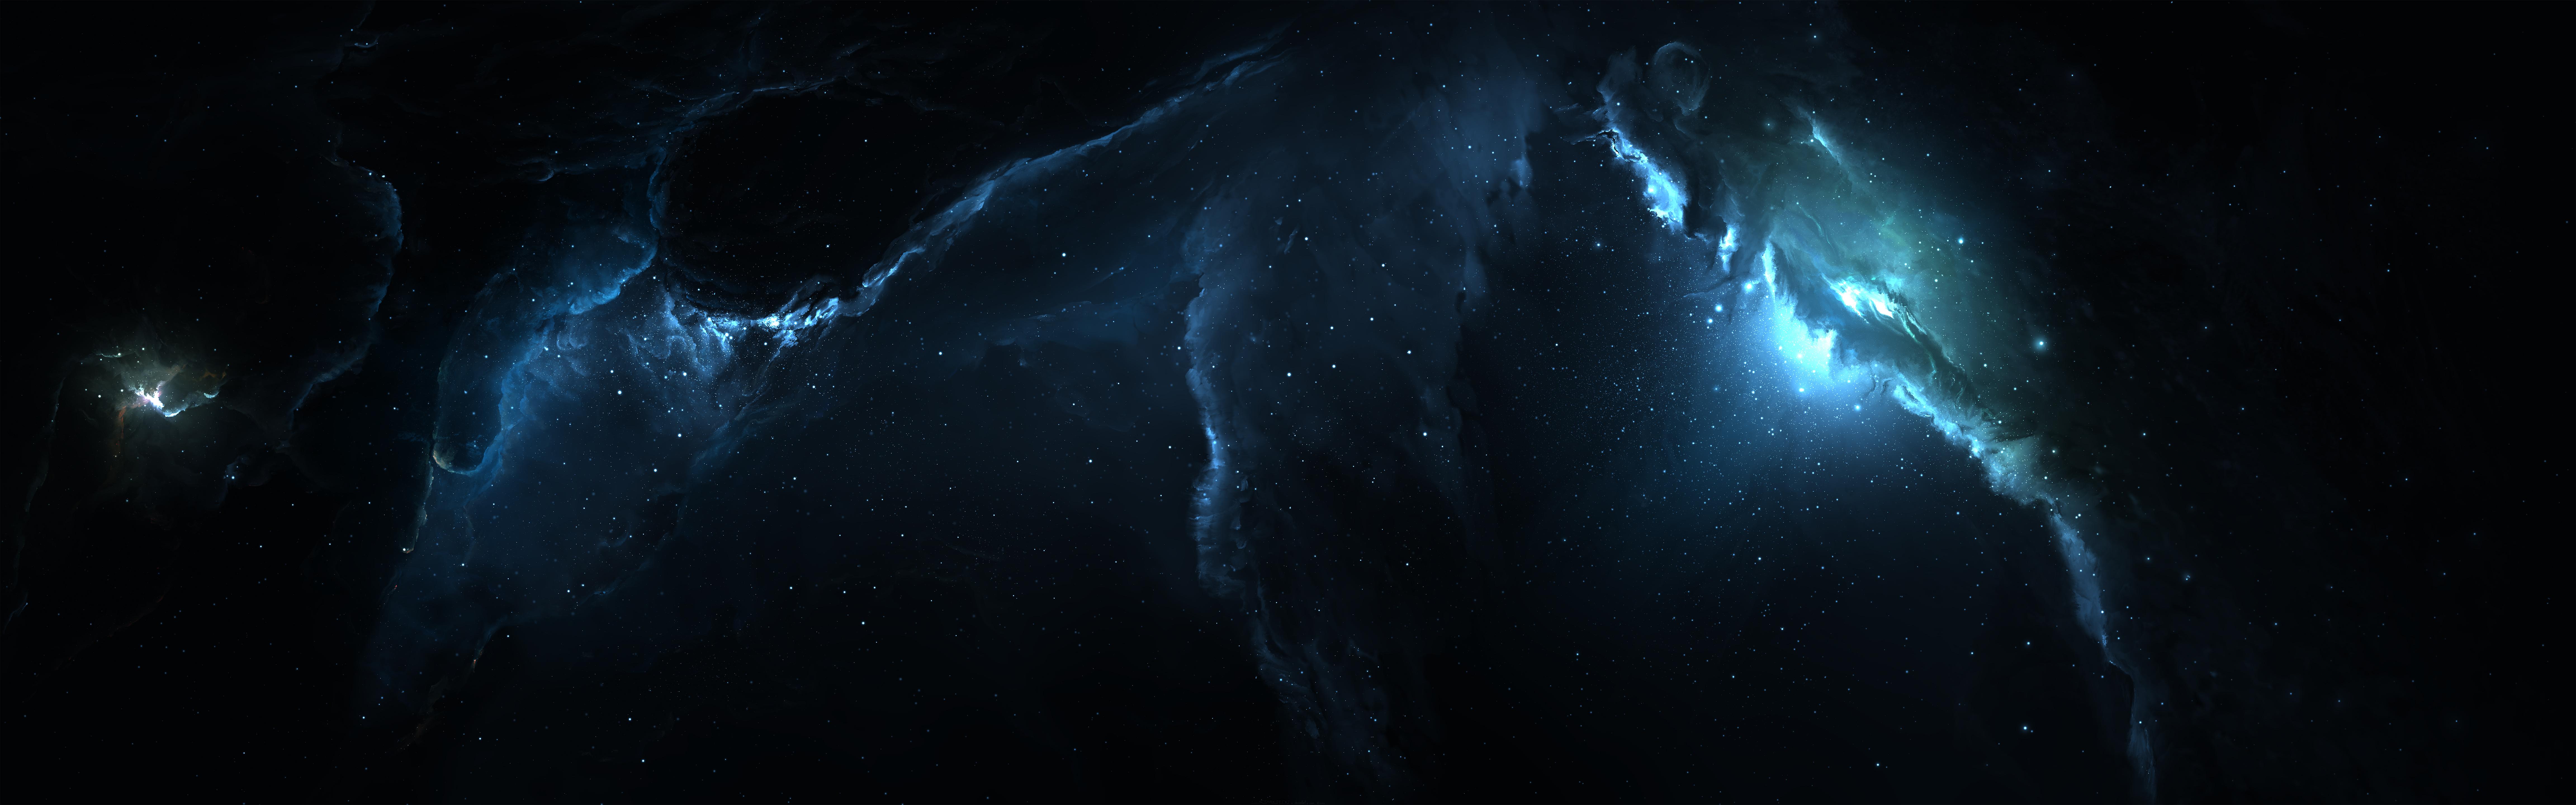 Atlantis Nebula 3 Dual Monitor 5k Retina Ultra HD Wallpaper And